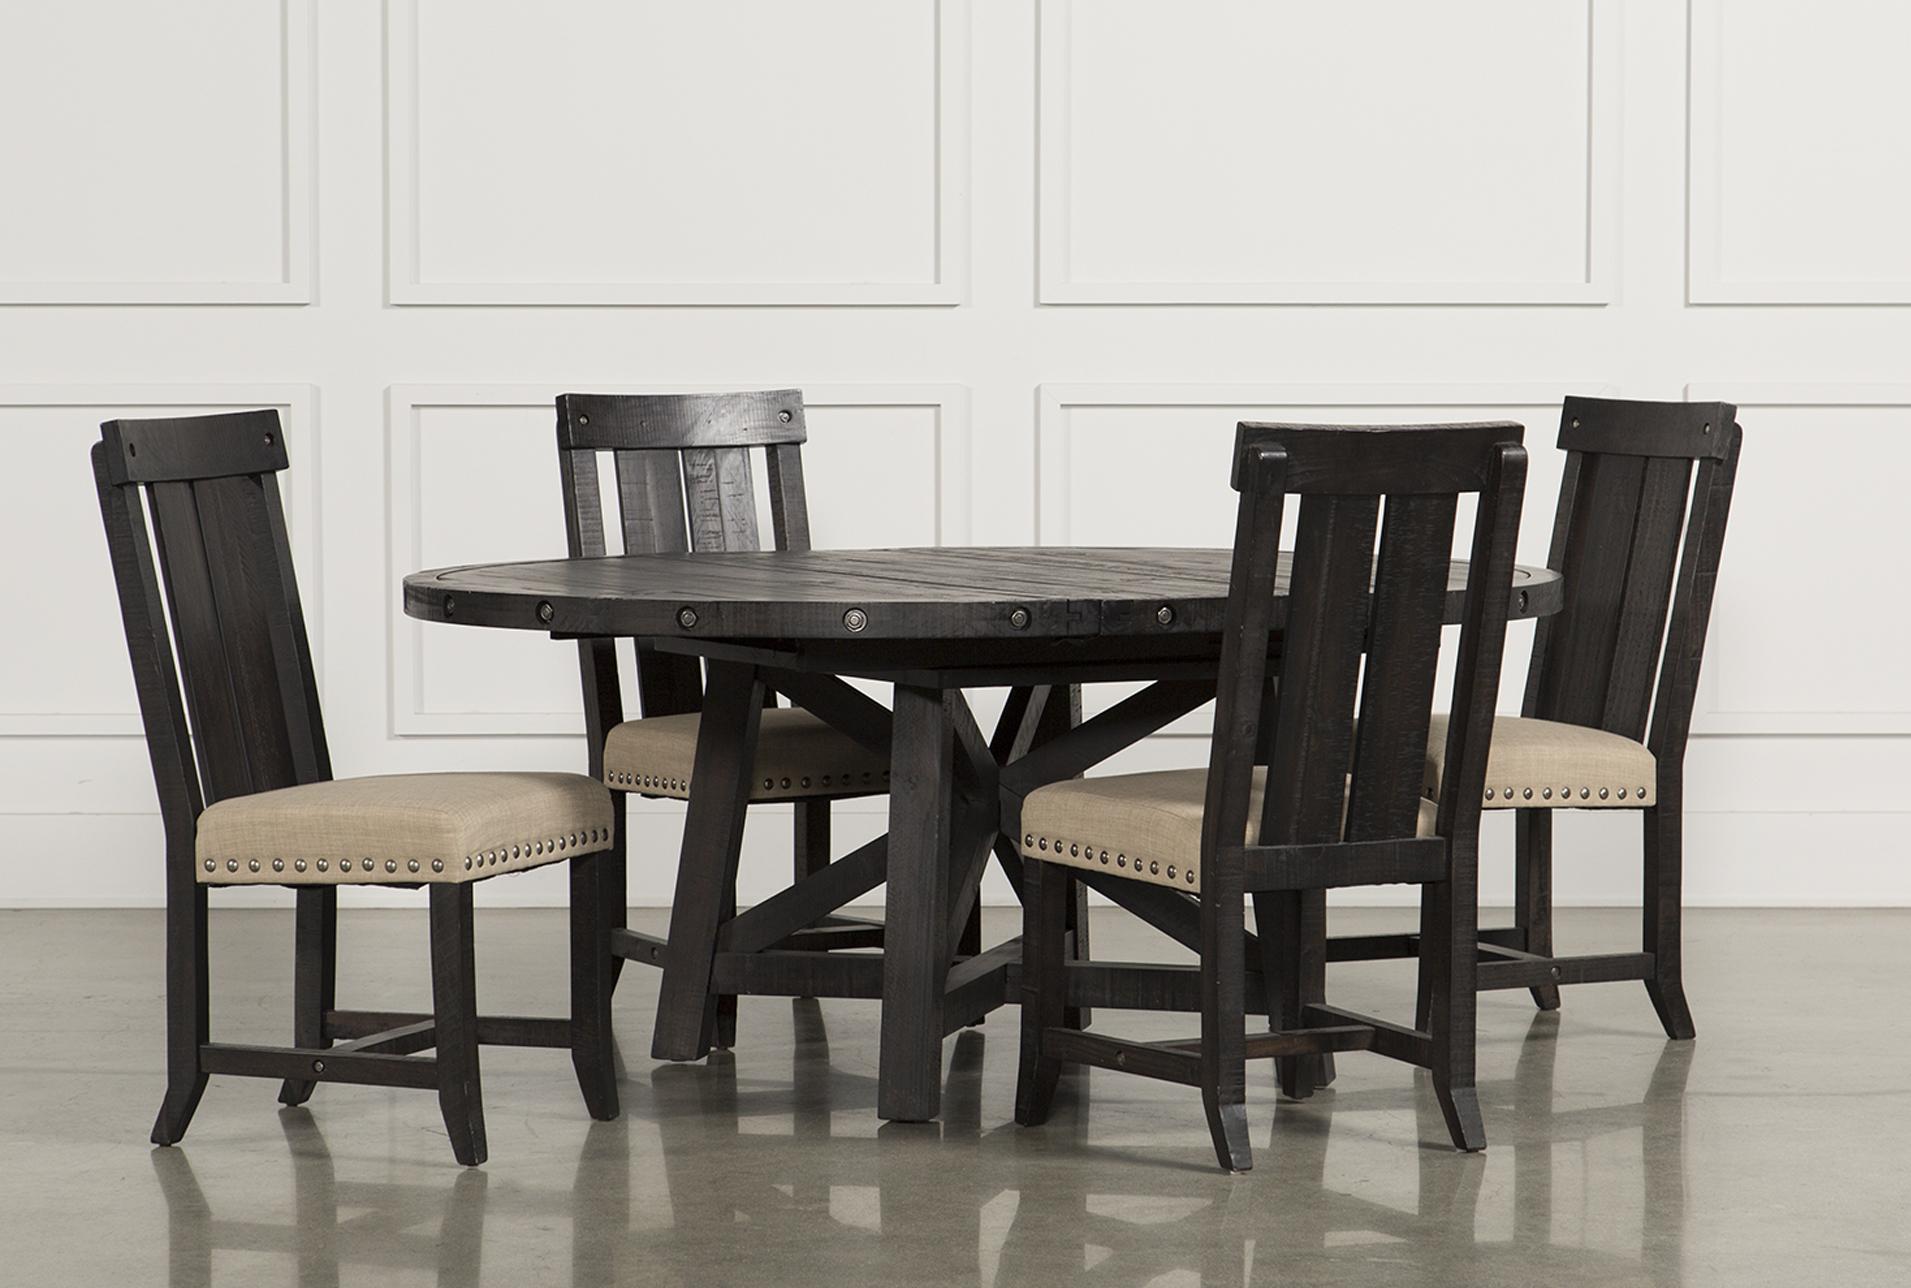 Superb Jaxon 5 Piece Extension Round Dining Set W/Wood Chairs   360